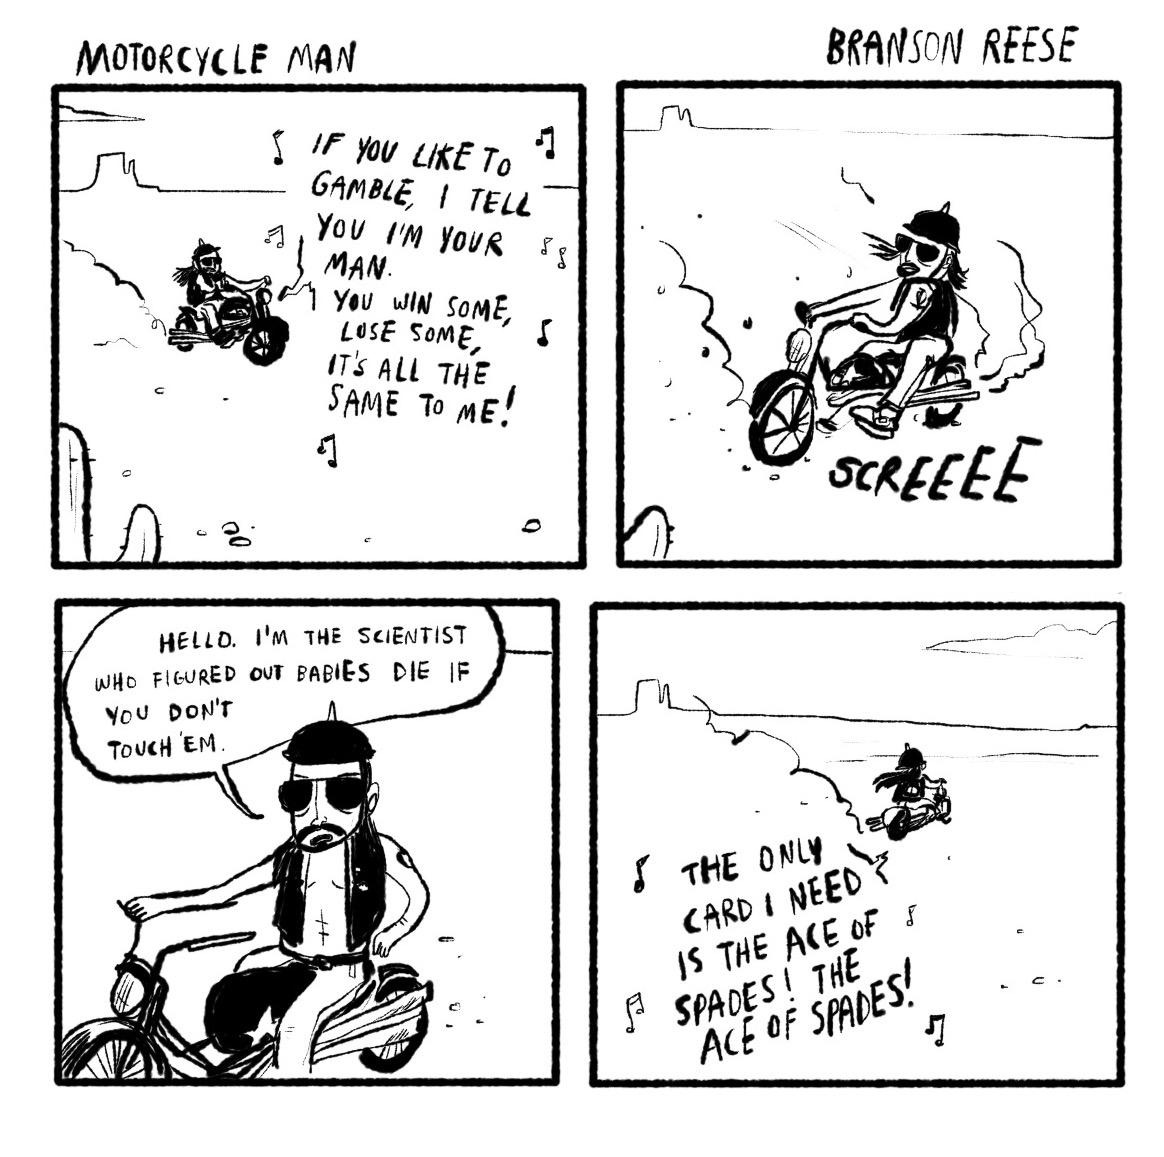 0064 motorcycleman4.jpg